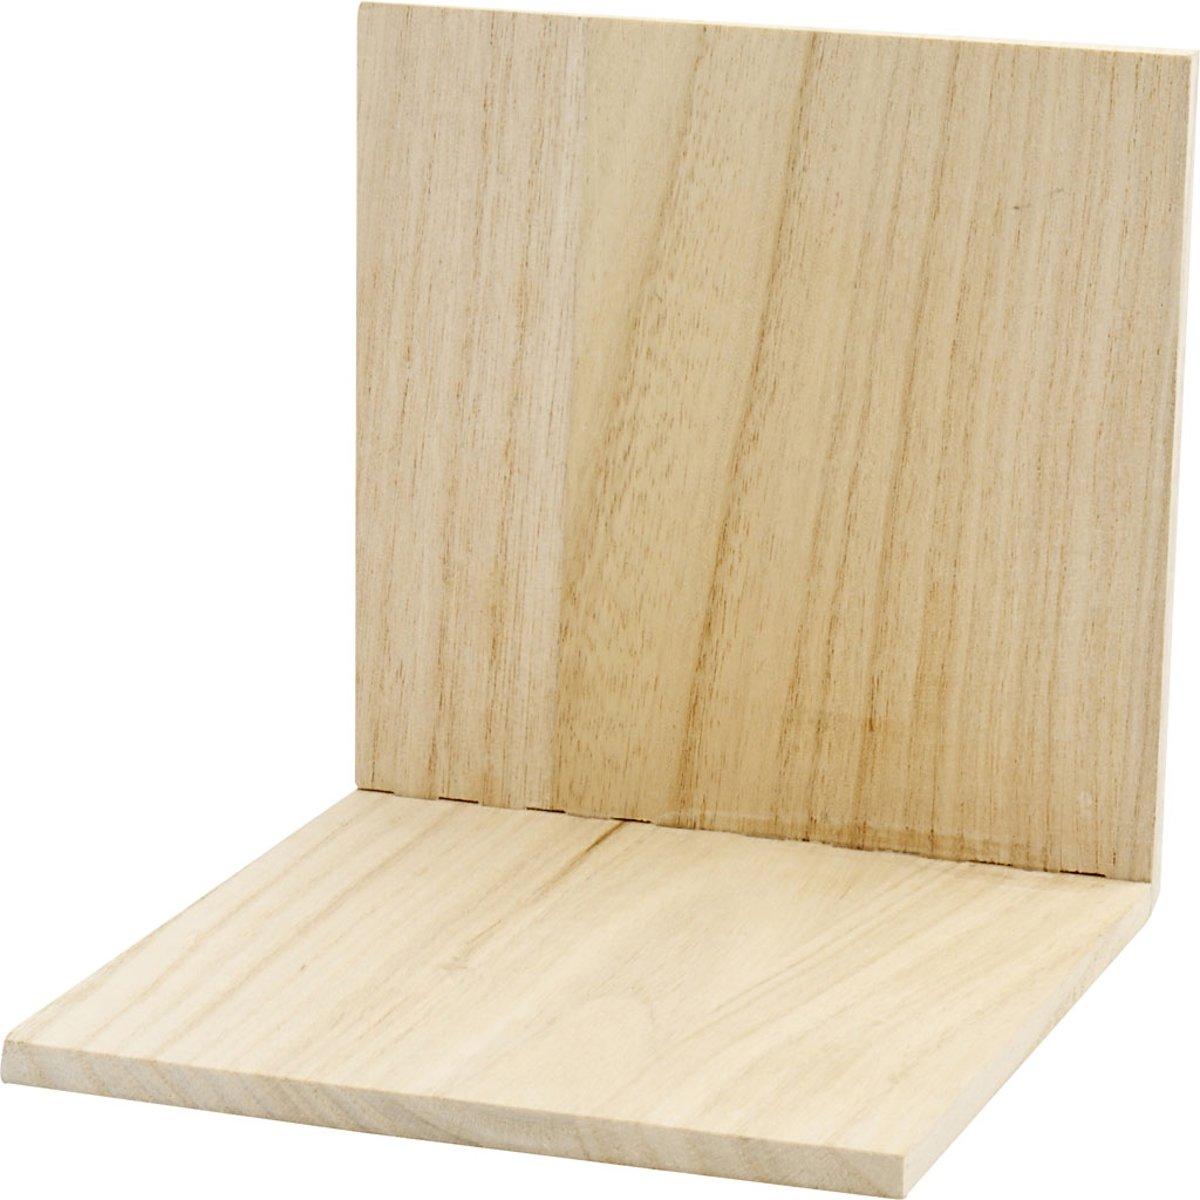 Boekensteun, afm 15x15x15 cm, Keizerin boom, 1stuk [HOB-57649] kopen